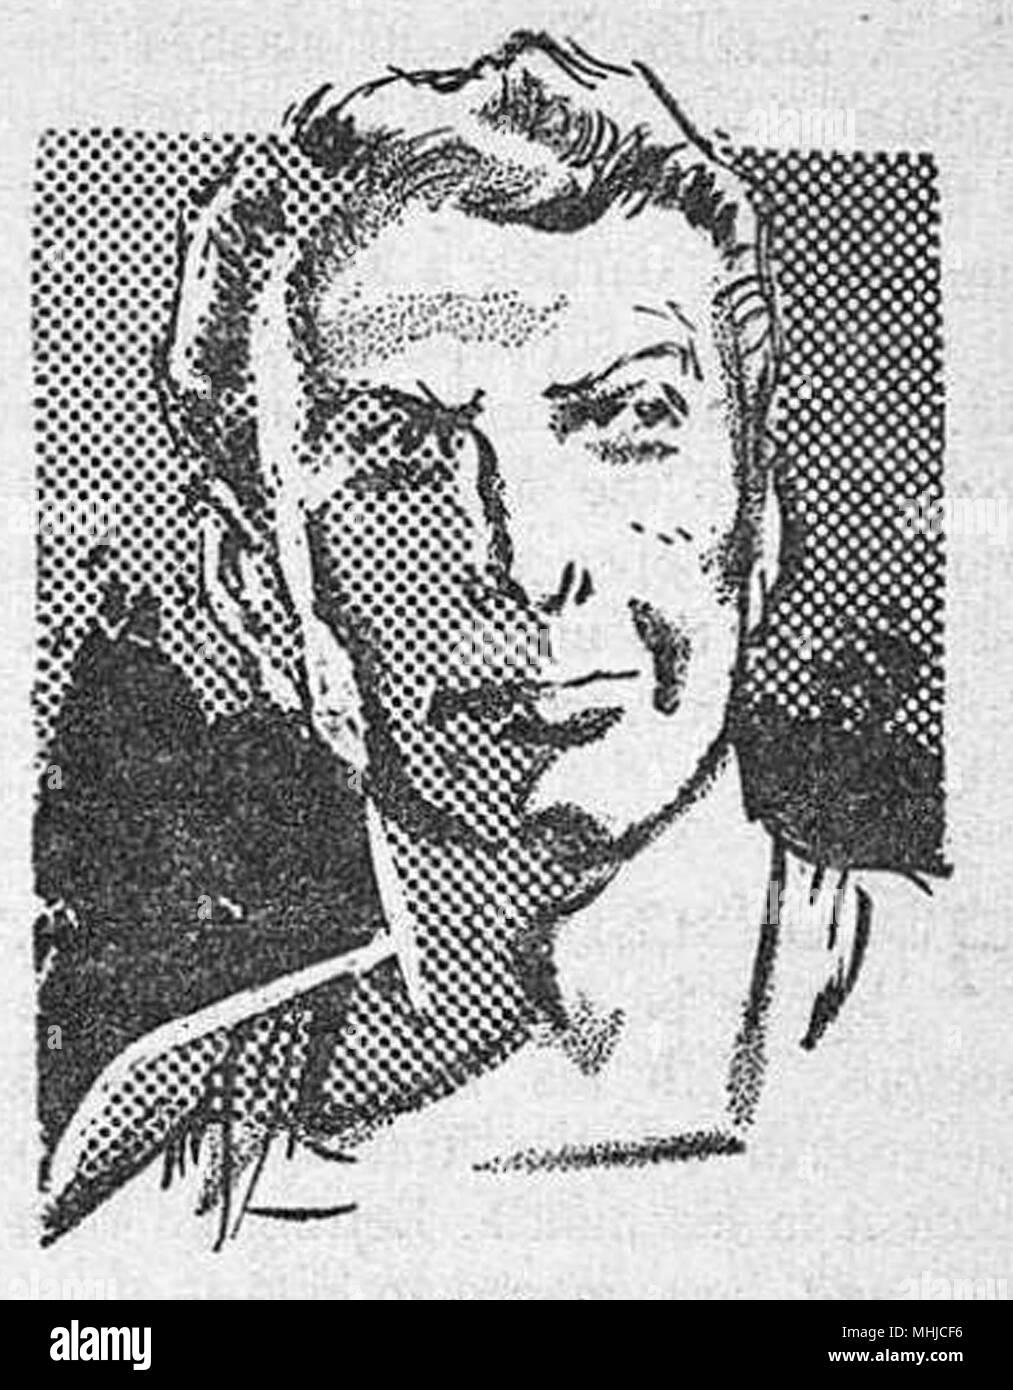 headshot of a man illustration - Stock Image